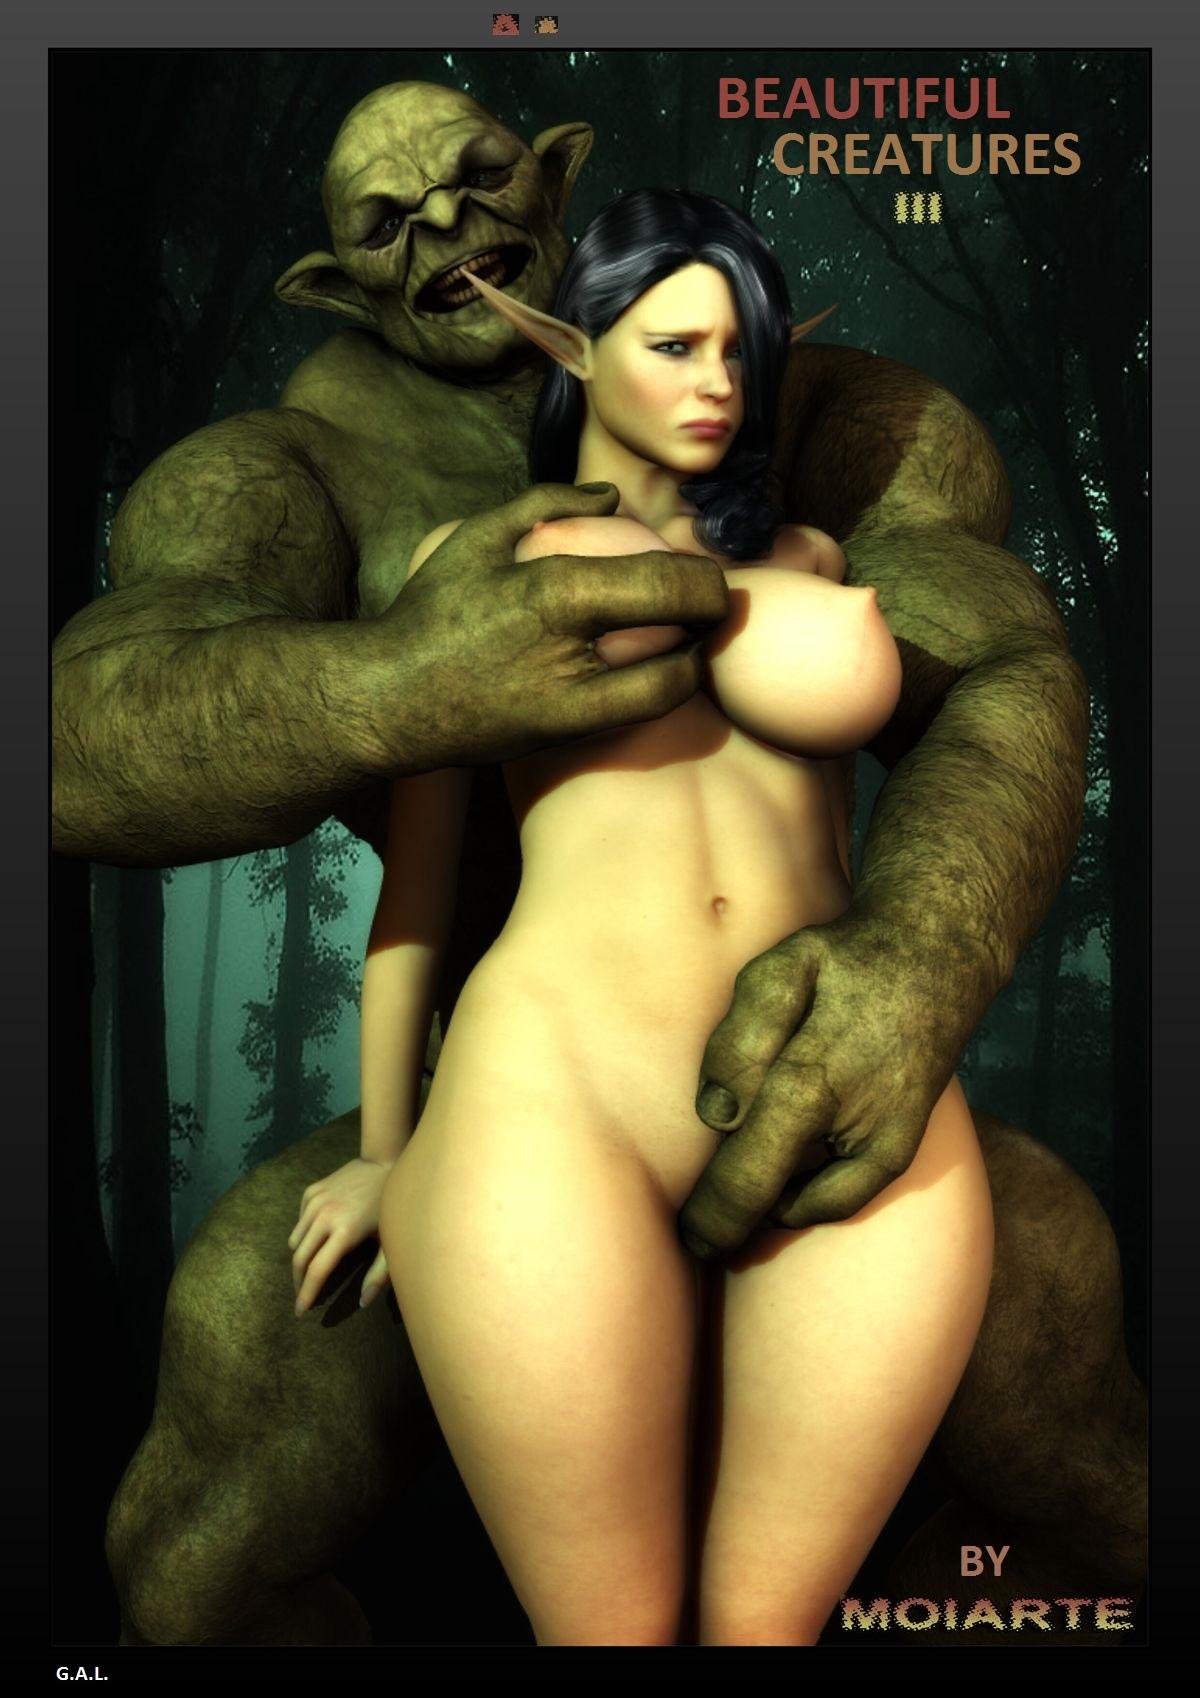 Beautiful Creatures Vol. 3- Moiarte image 1